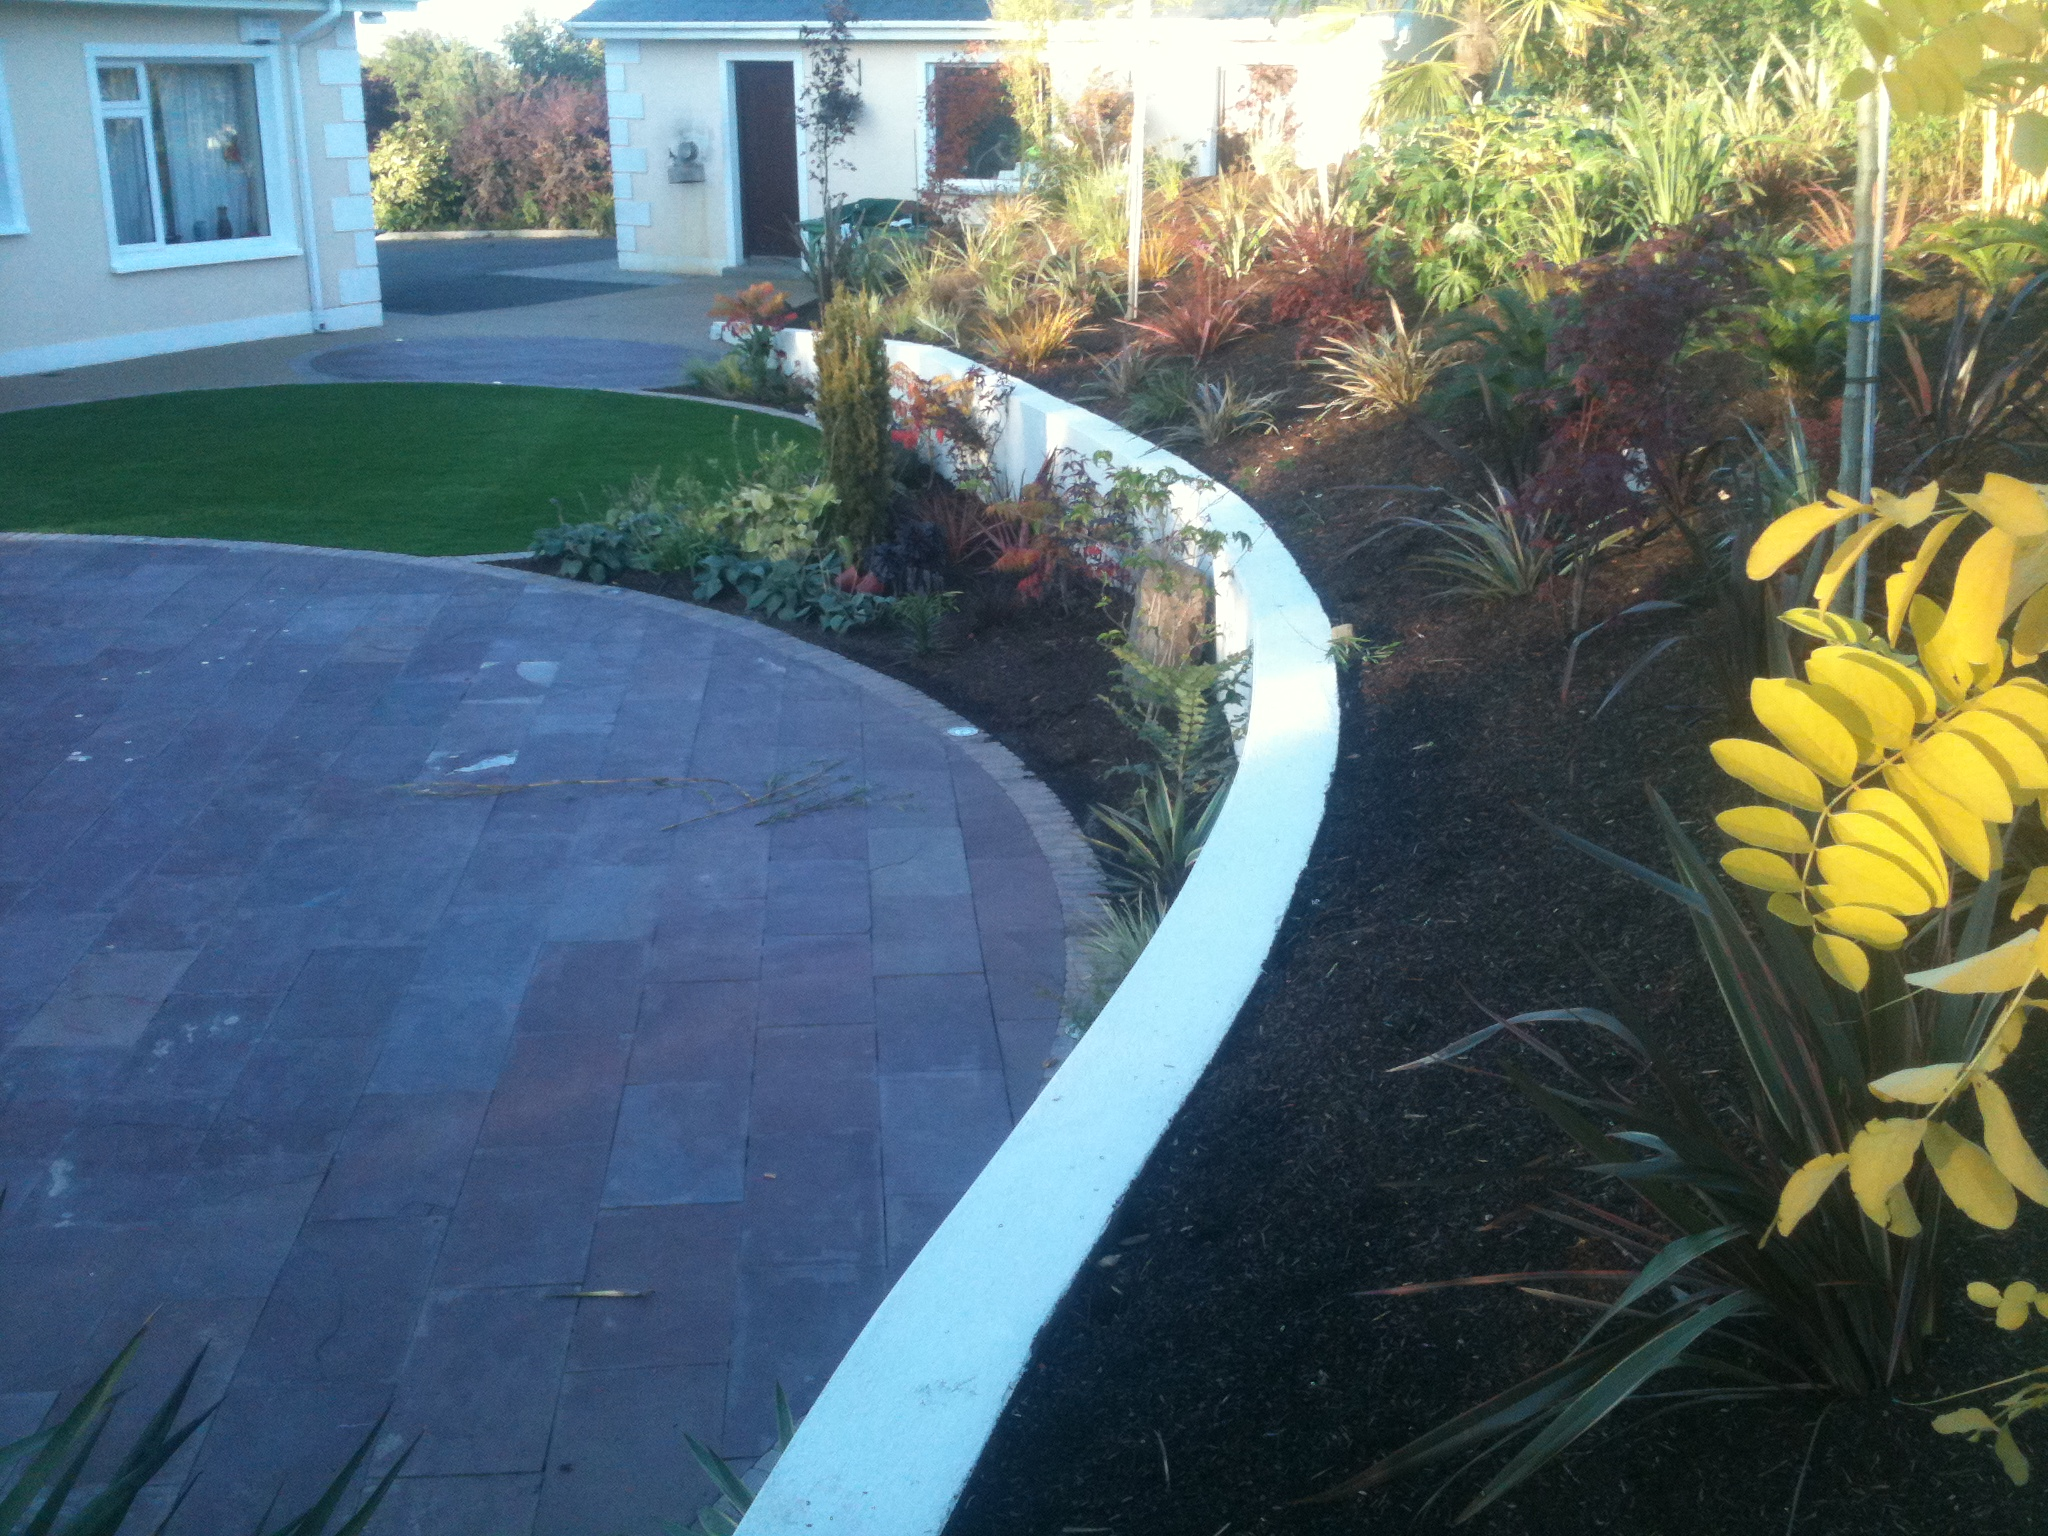 Garden landscaped with TigerTurf